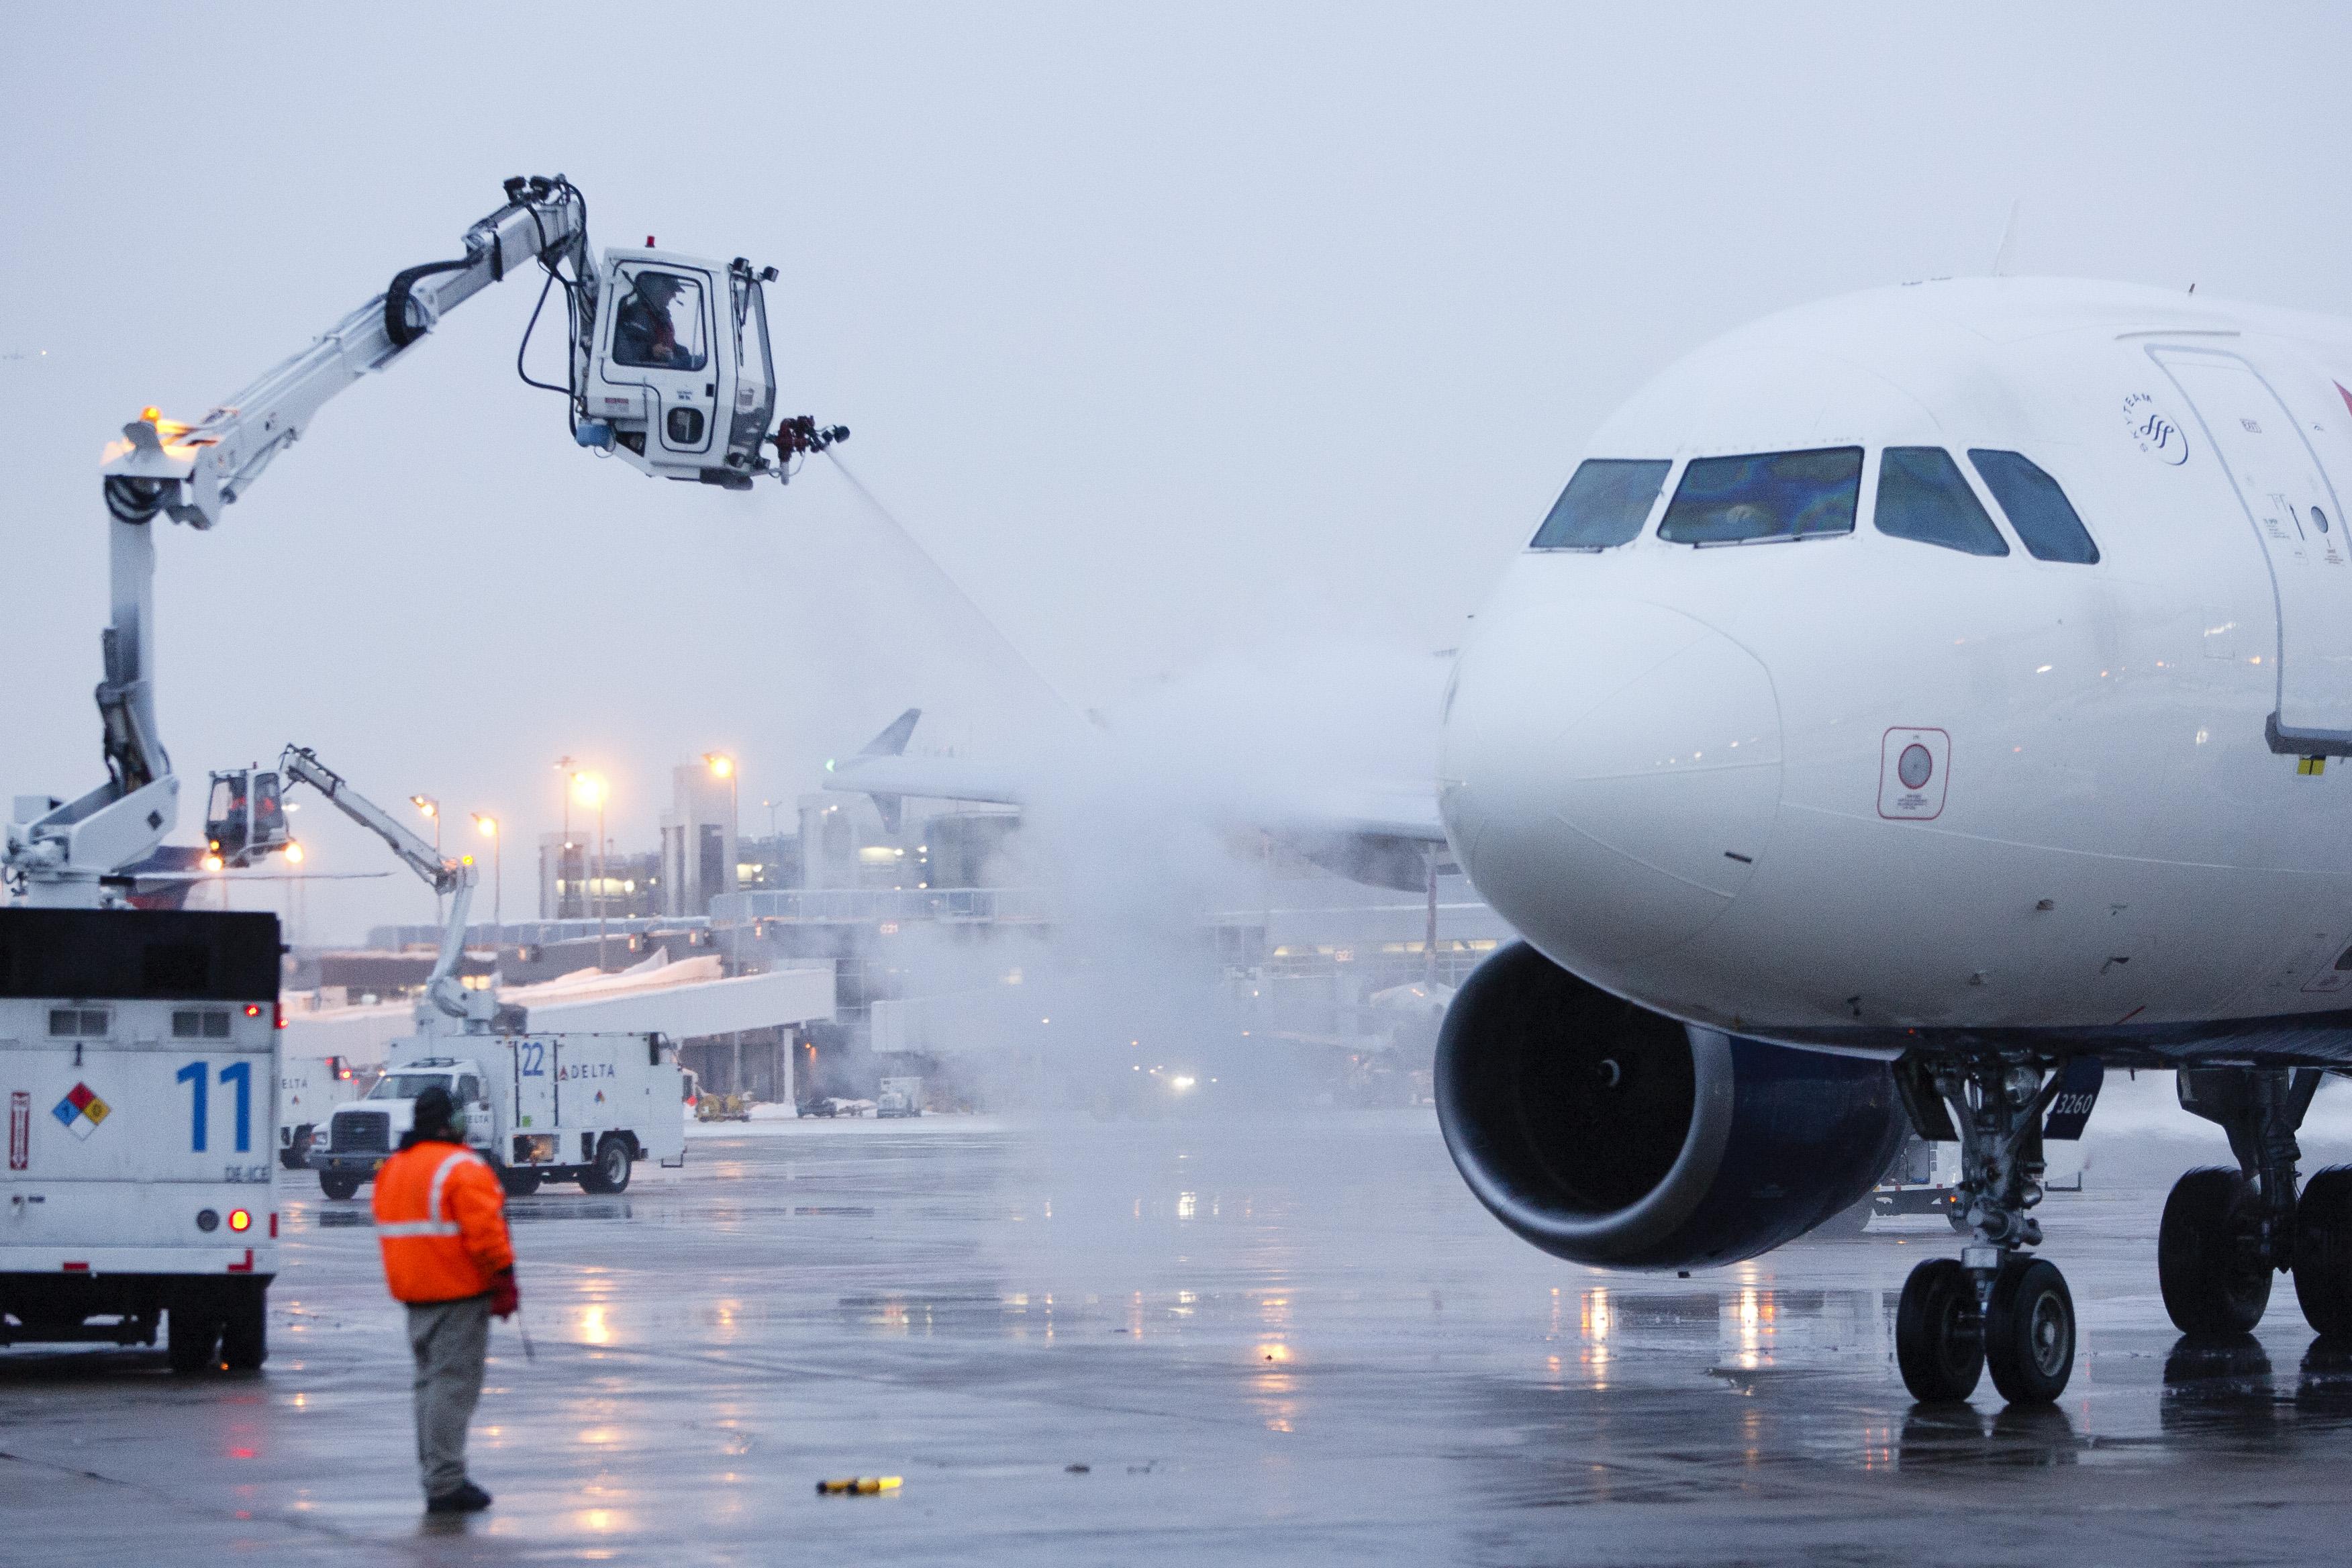 Deicing plane